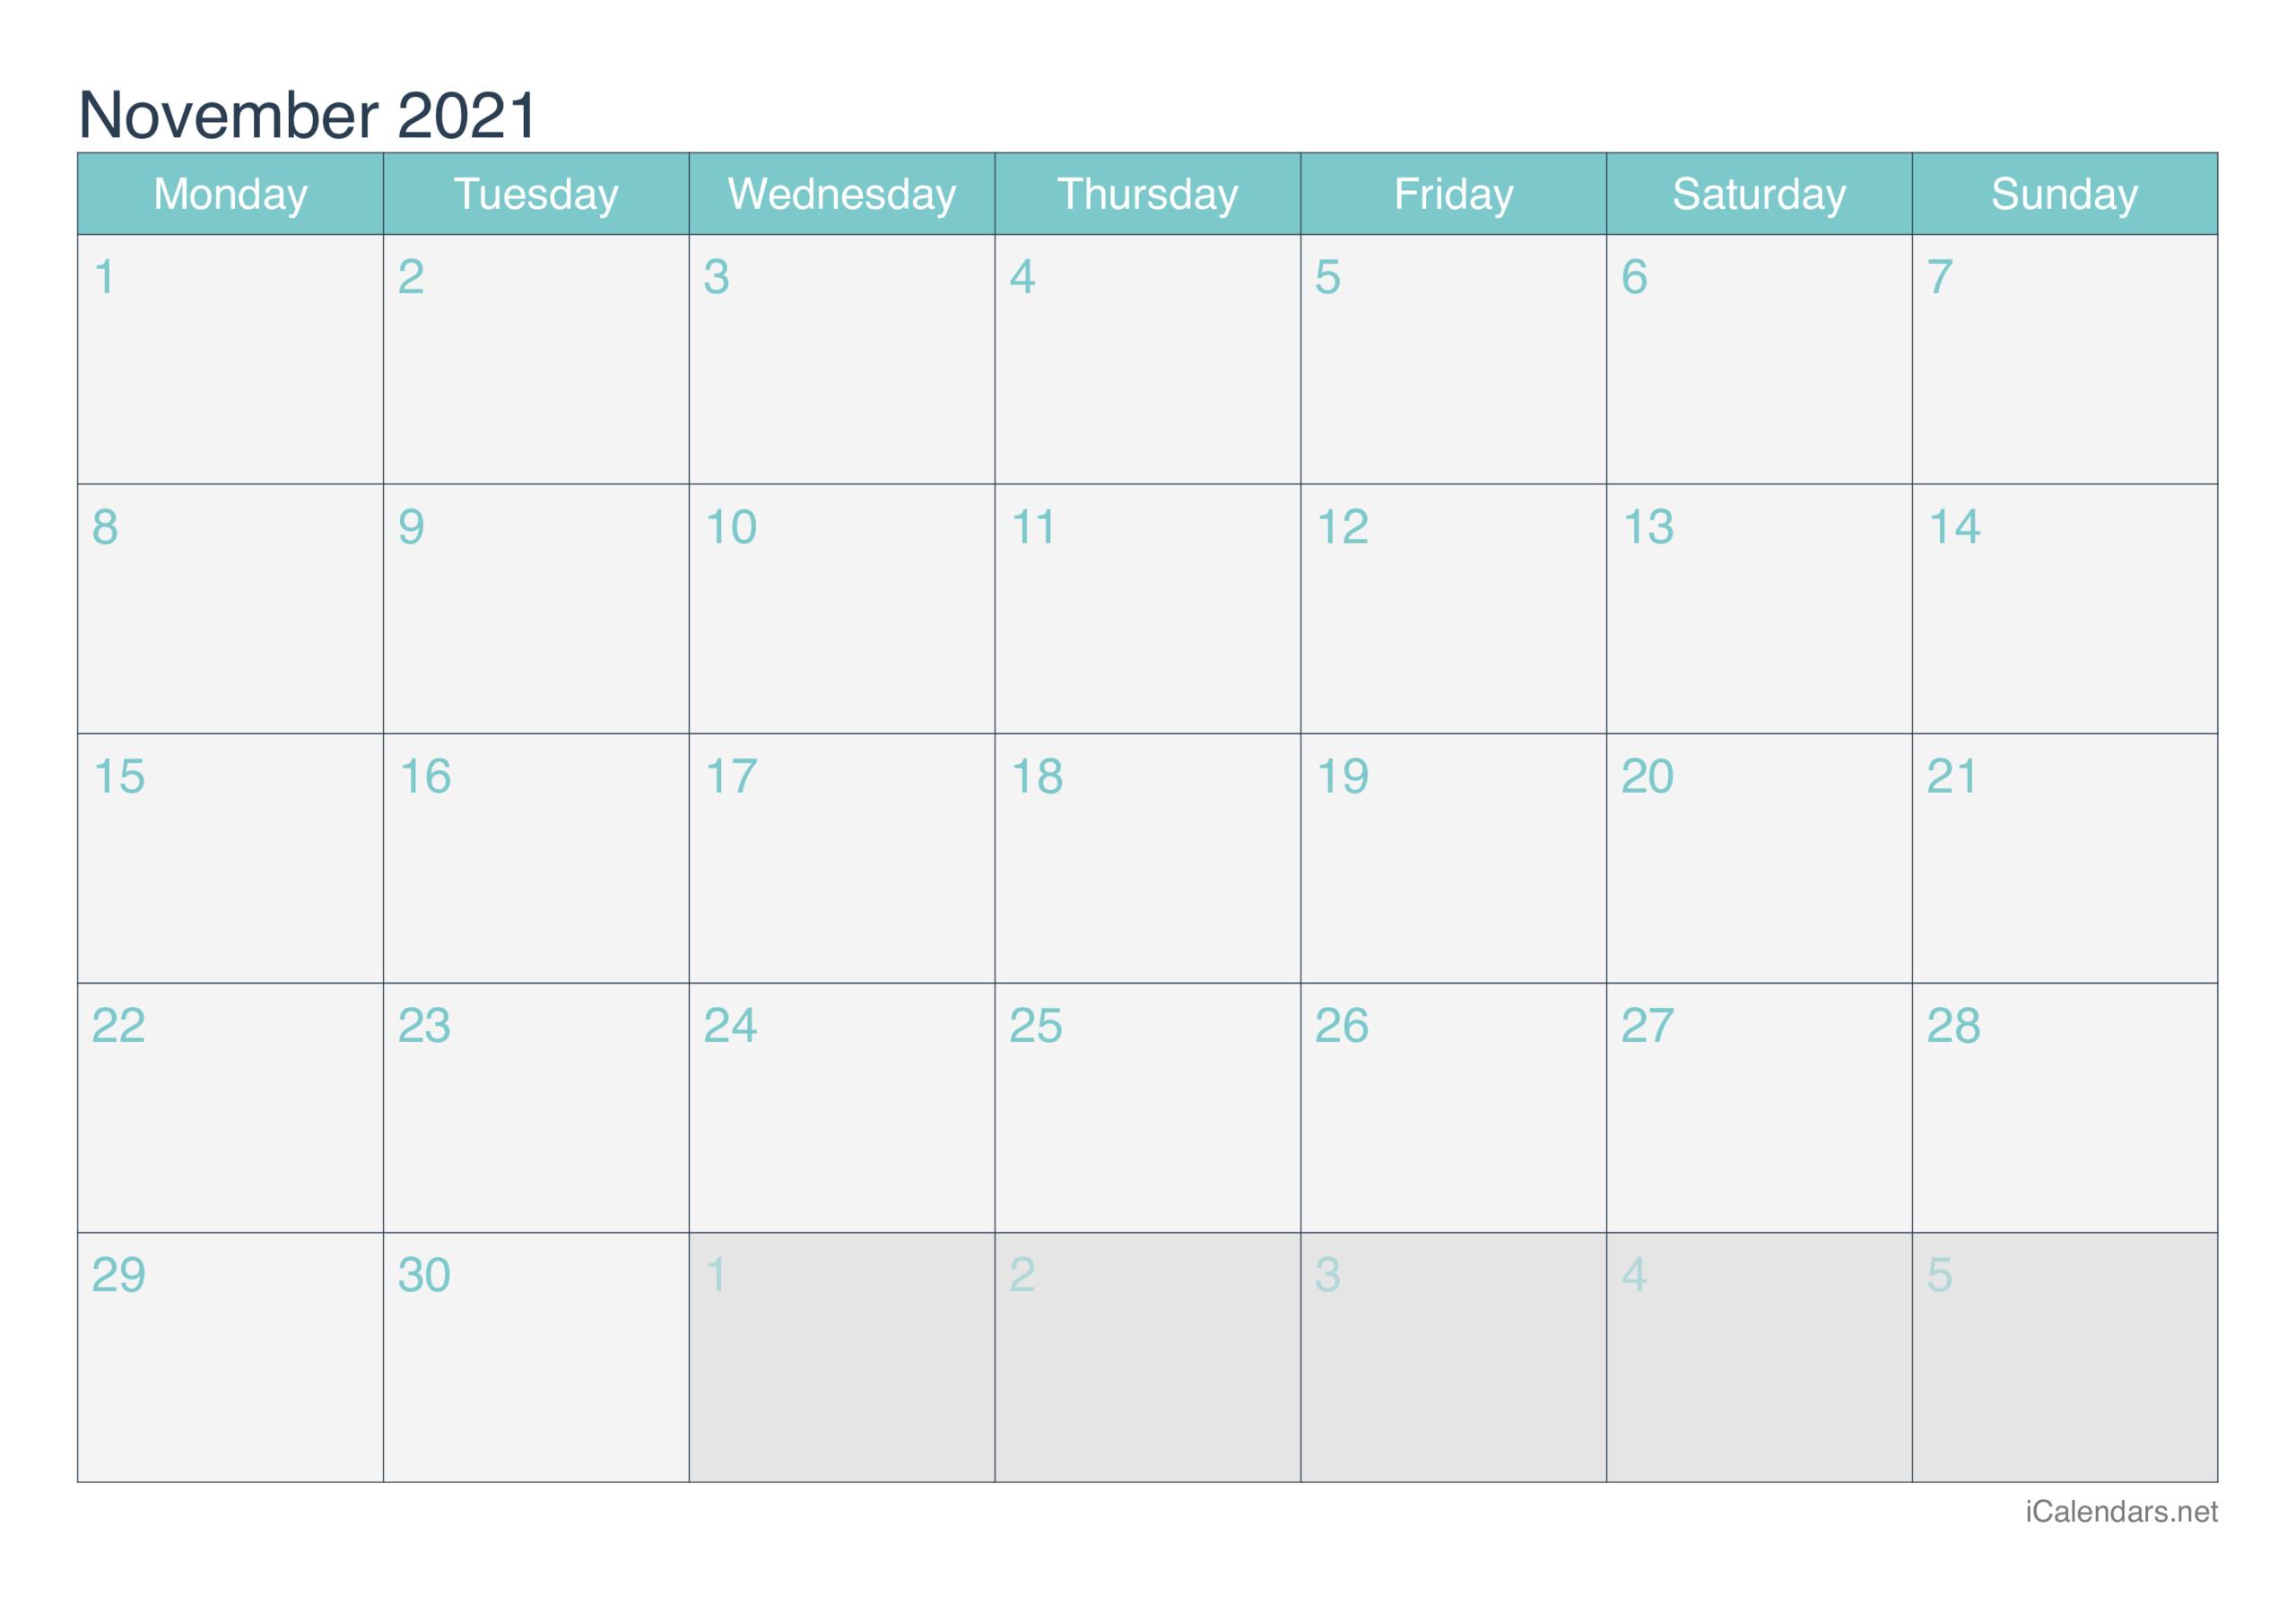 November 2021 Printable Calendar - Icalendars